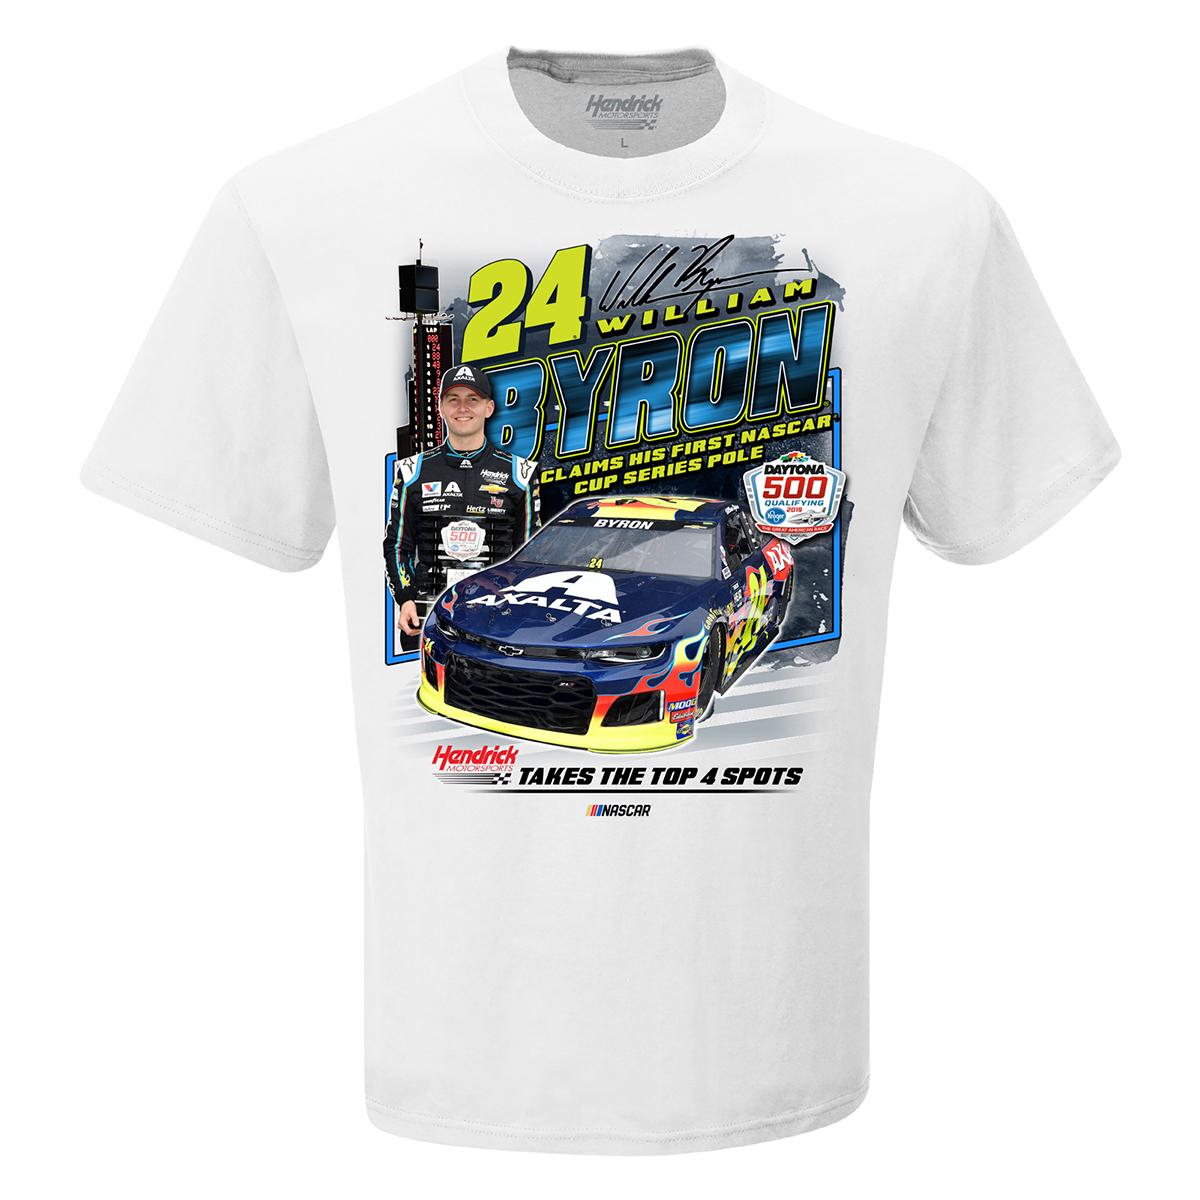 William Byron 2019 NASCAR Daytona 500 Pole Winner T-shirt